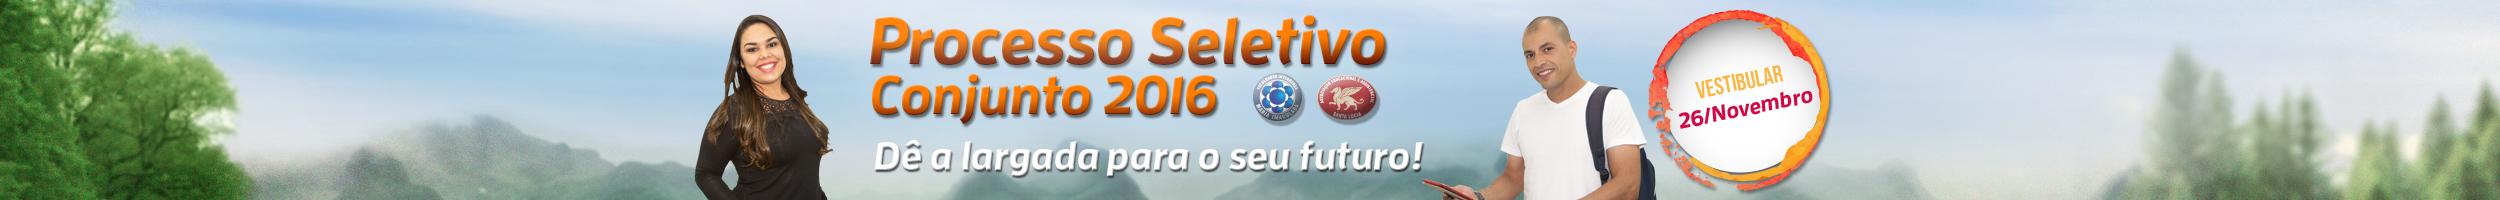 banner_site_imaculada_2